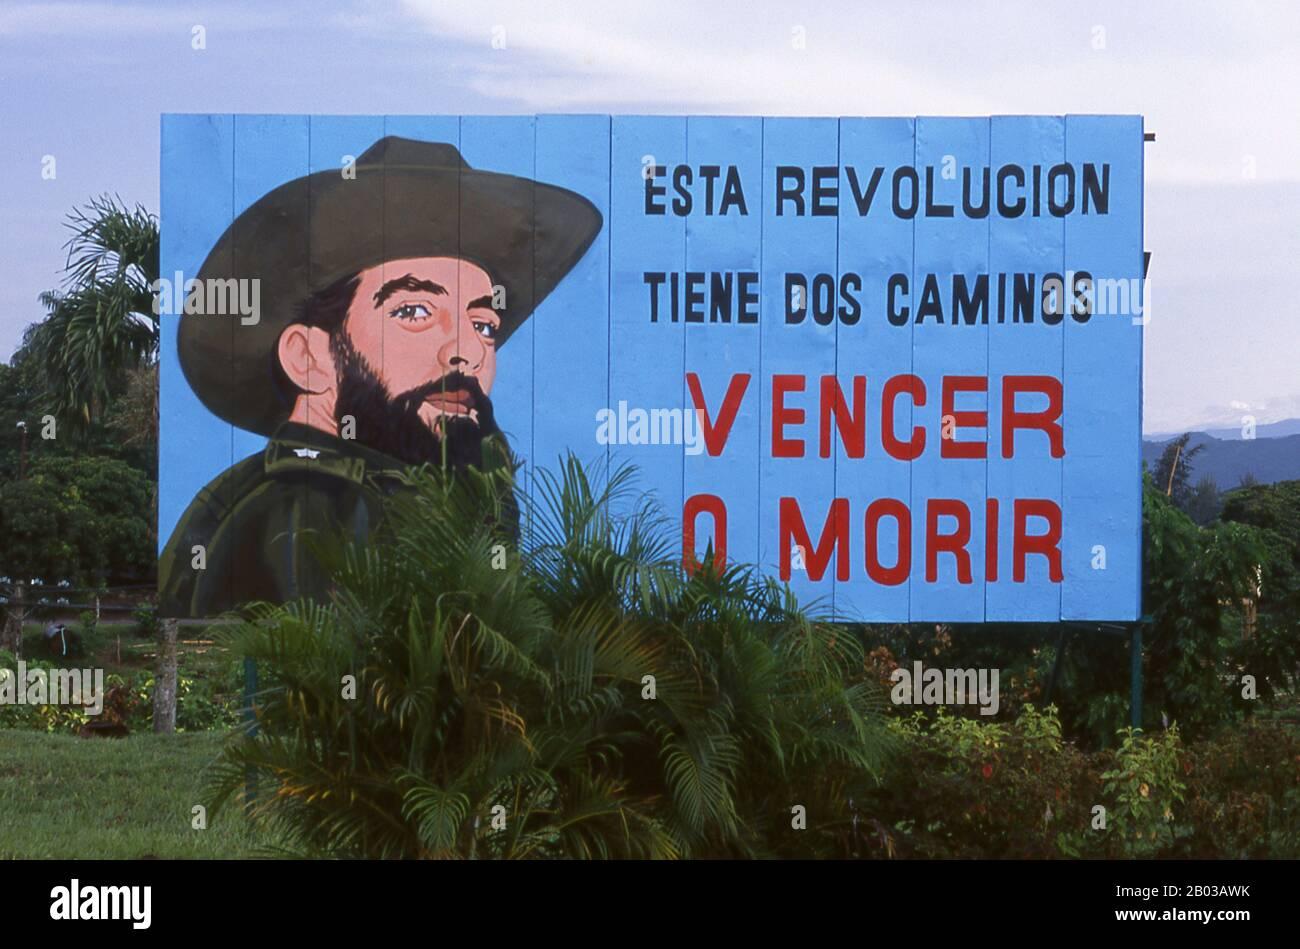 Camilo Cienfuegos Gorriaran February 6 1932 October 28 1959 Was A Cuban Revolutionary Born In Lawton Havana Raised In An Anarchist Family That Had Left Spain Before The Spanish Civil War